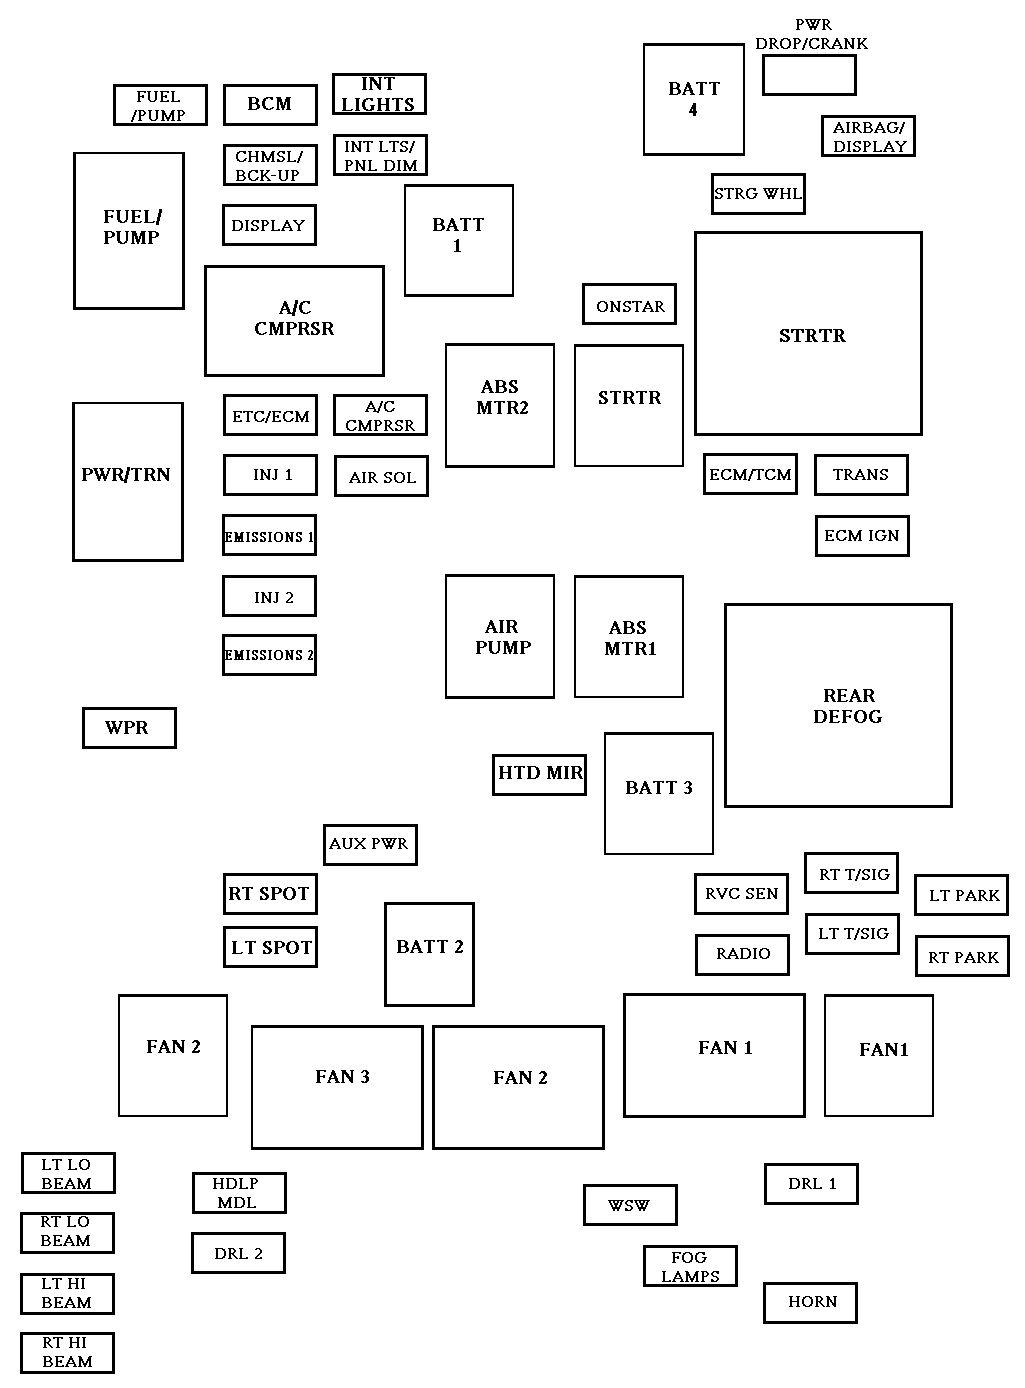 1979 chevy impala fuse box diagram 2011 chevy impala fuse box diagram